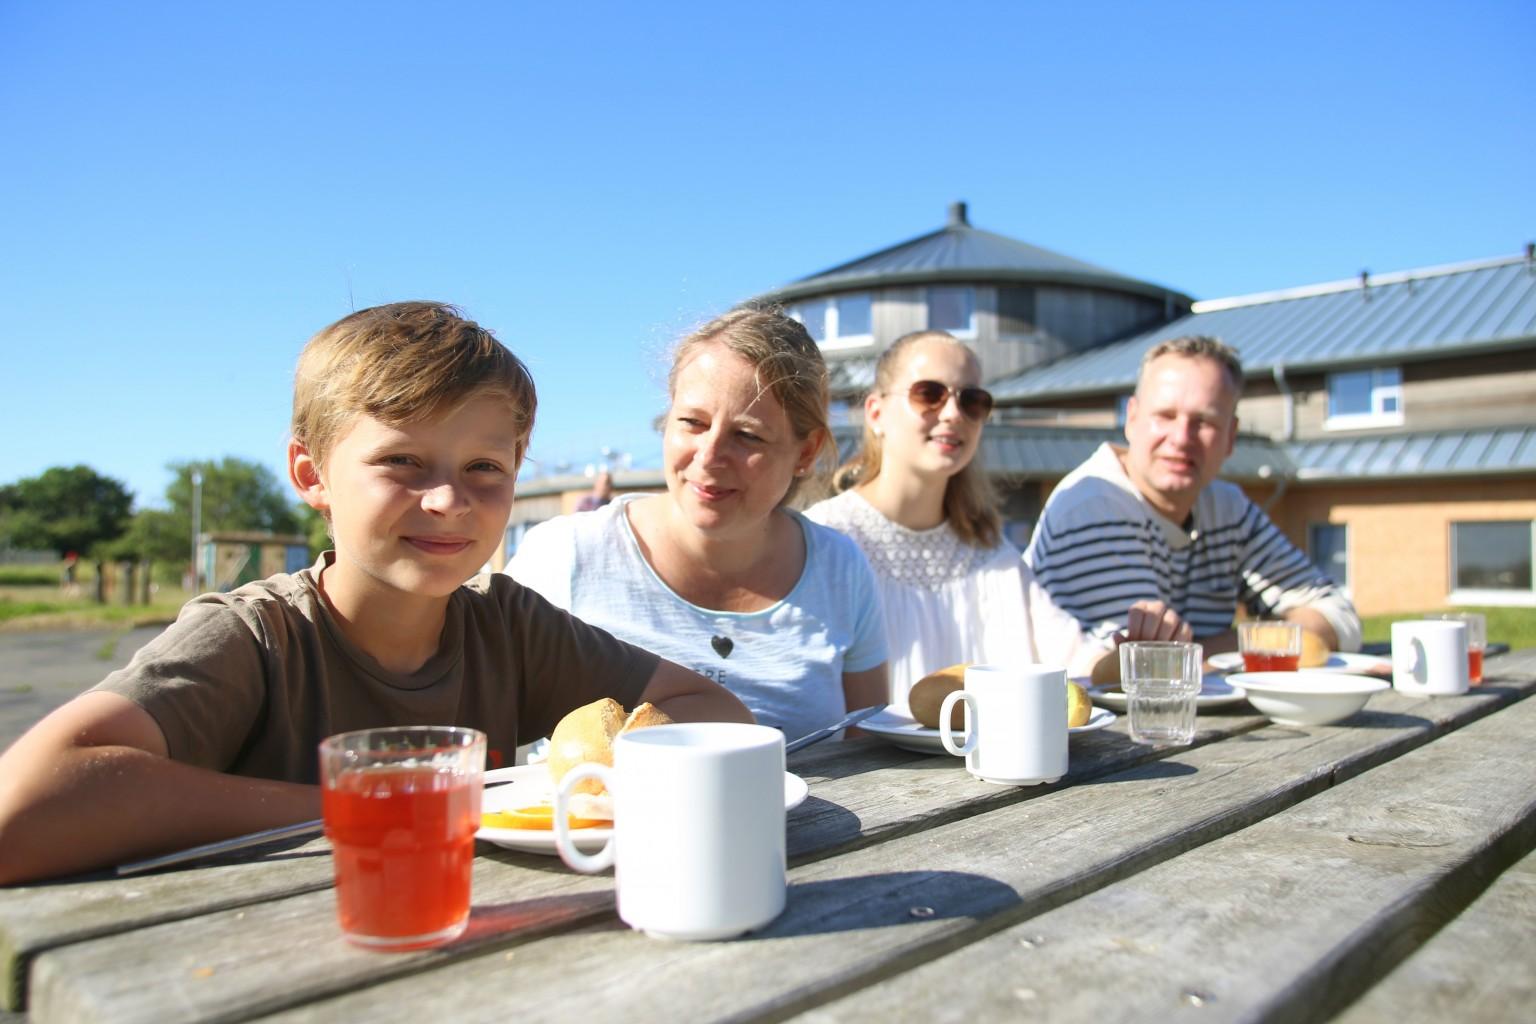 Jugendherbergen im Norden öffnen ohne Kerngeschäft